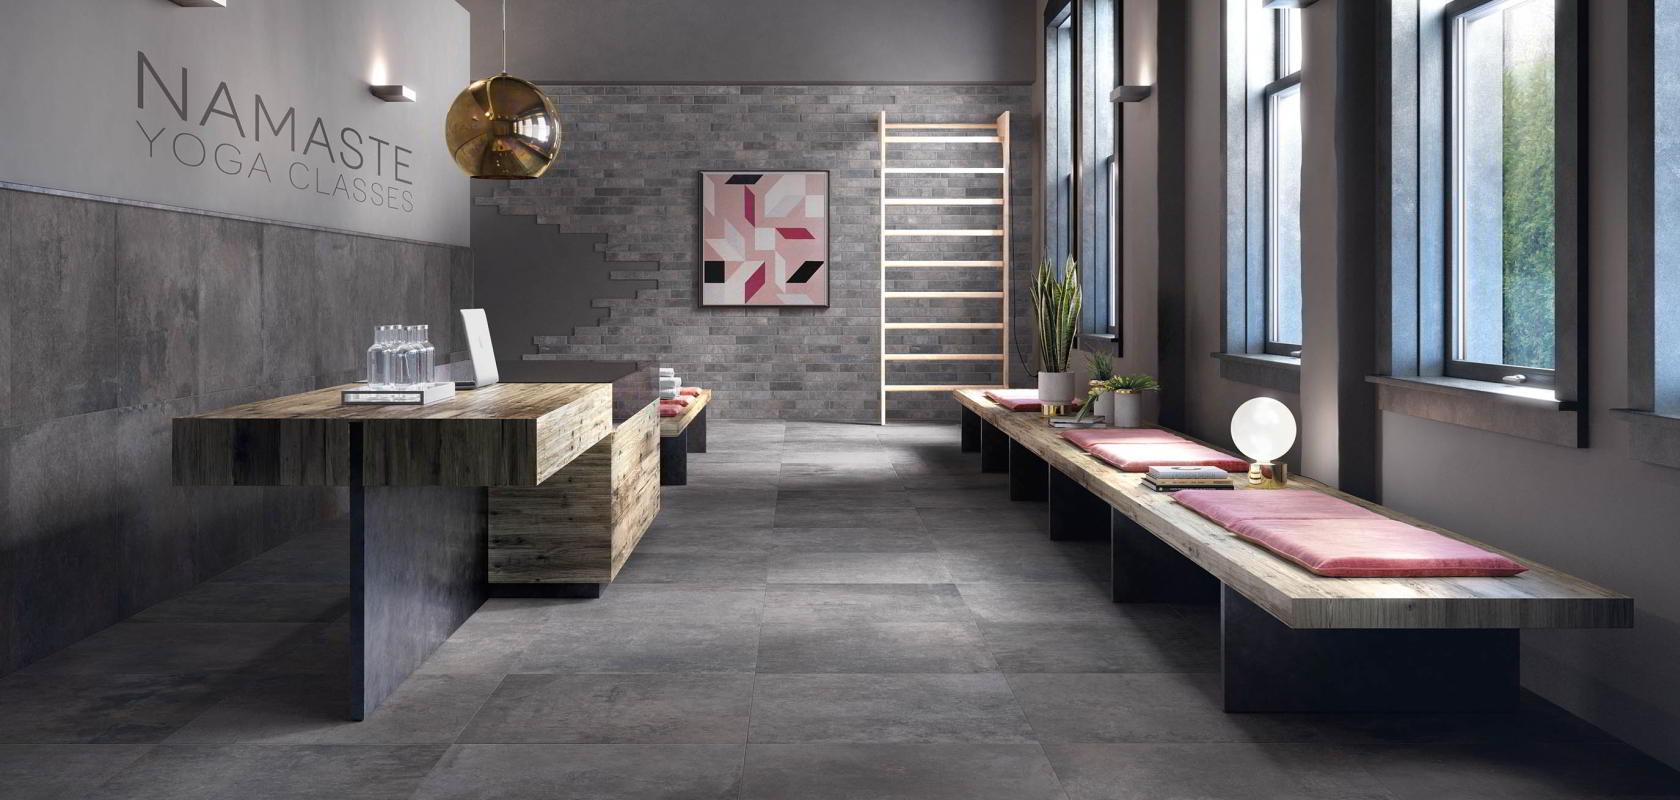 carrelage supergres s rie story 75x75 1 choix carrelage carrelage supergres carrelage. Black Bedroom Furniture Sets. Home Design Ideas